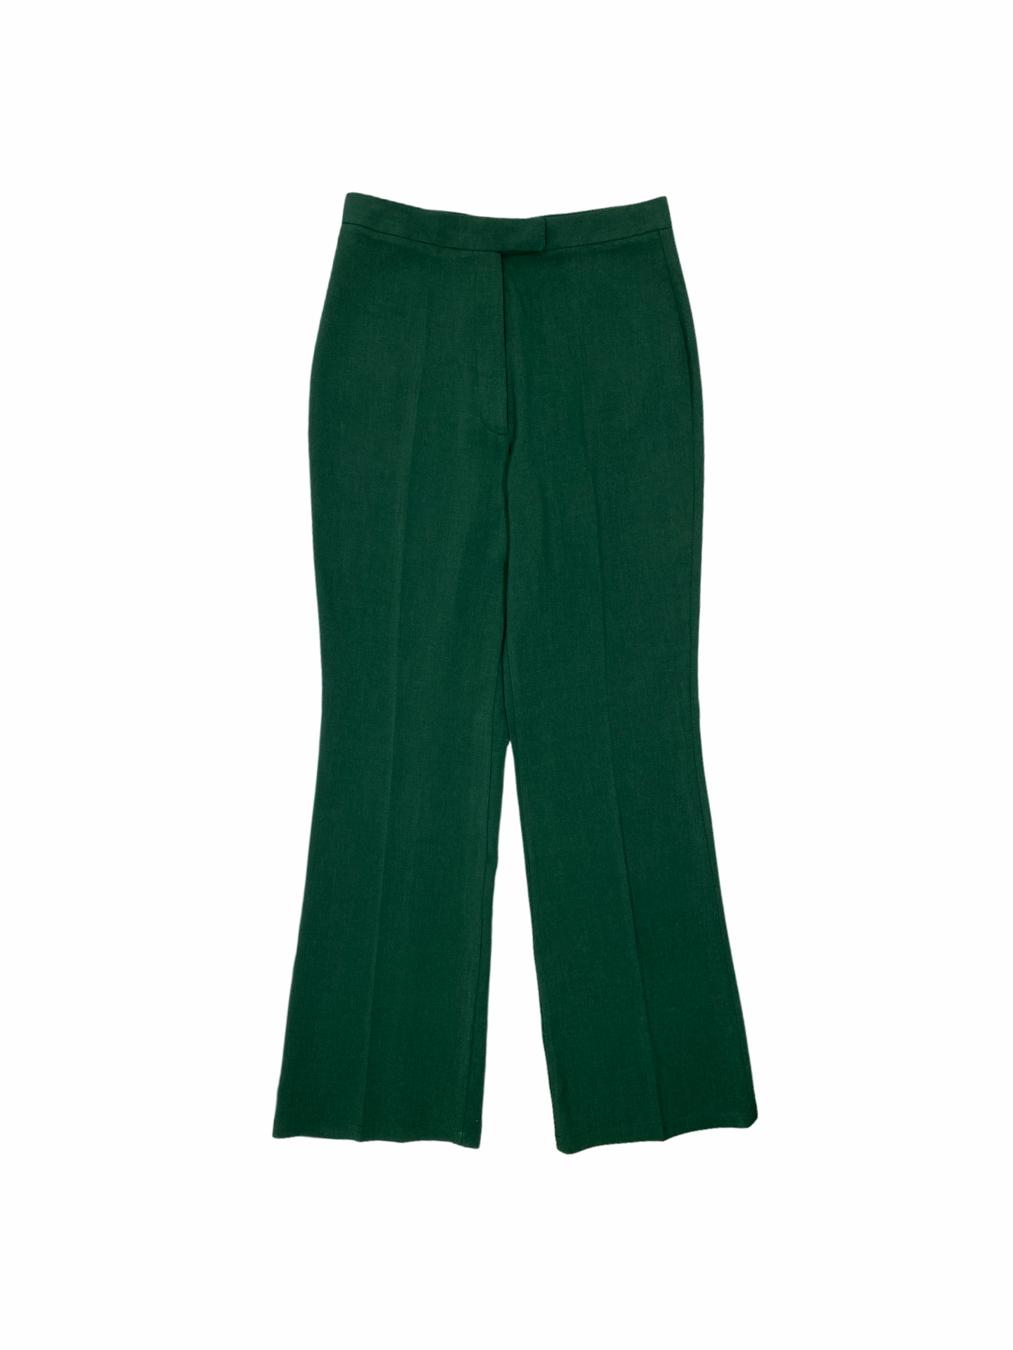 Womens Shaggy Pants (Green)